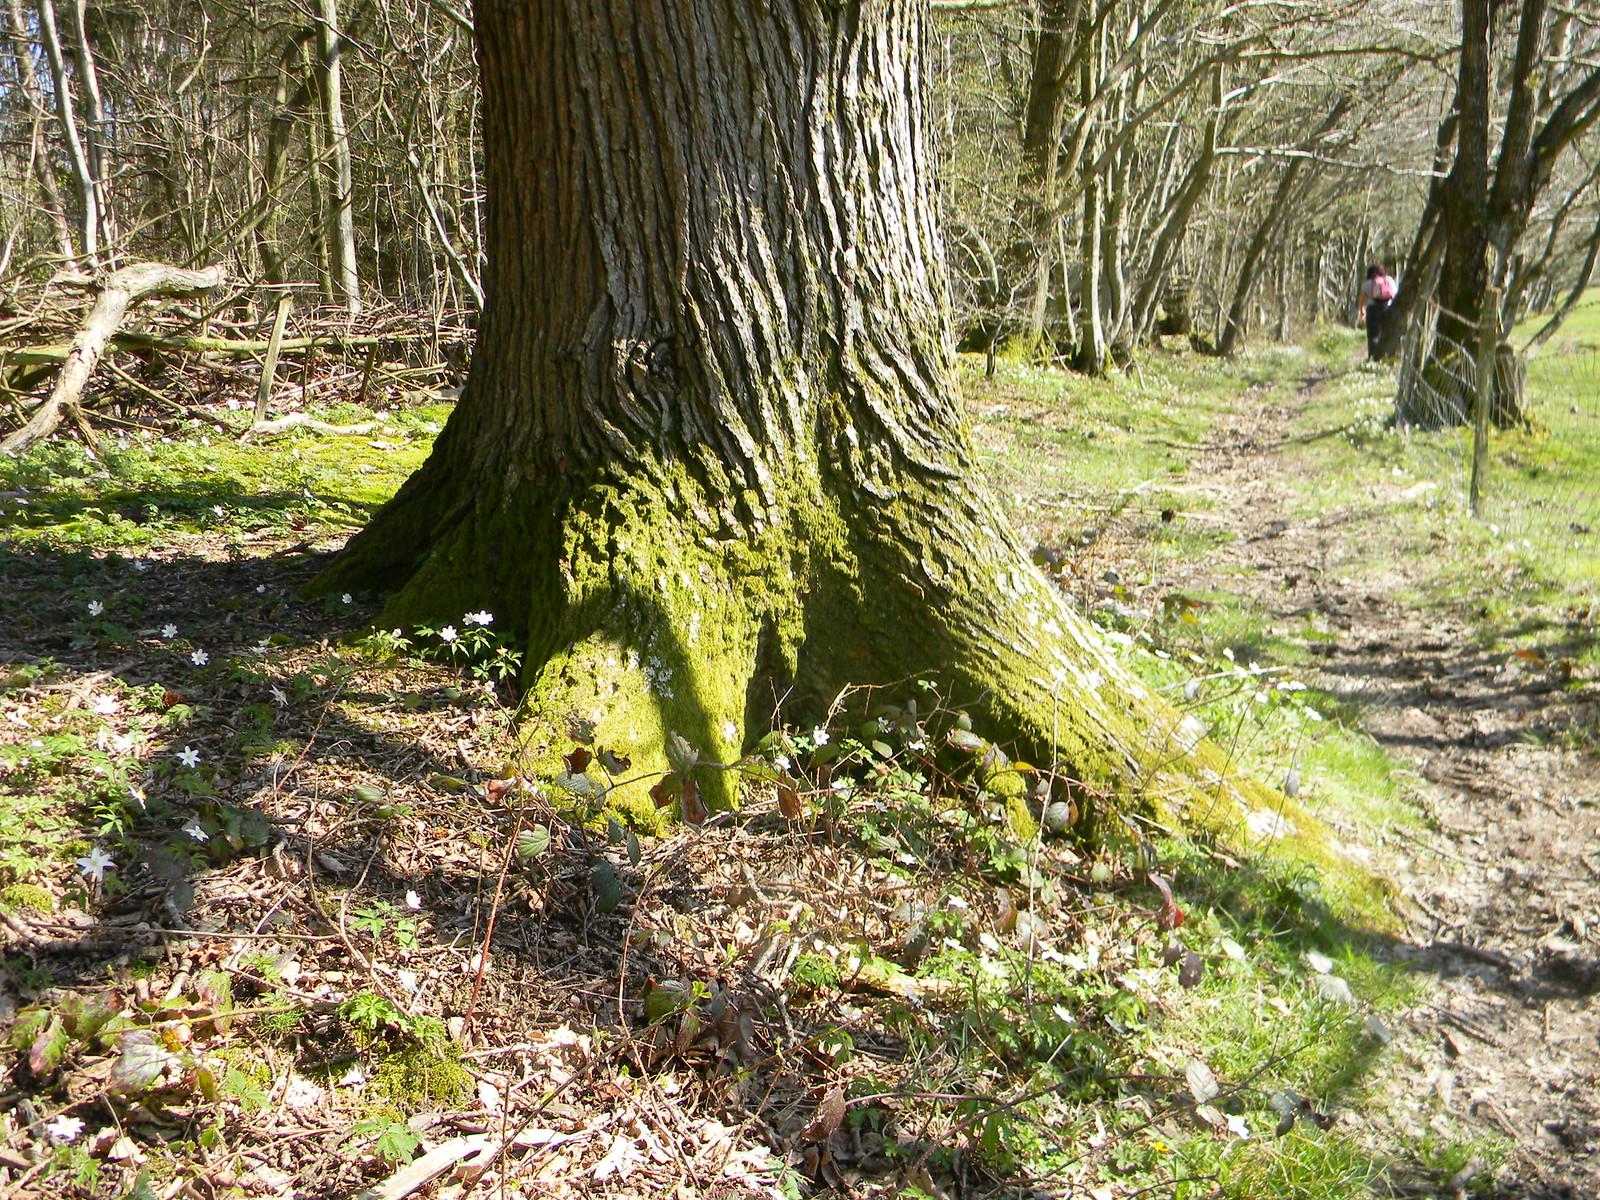 Treestump Robertsbridge to Battle